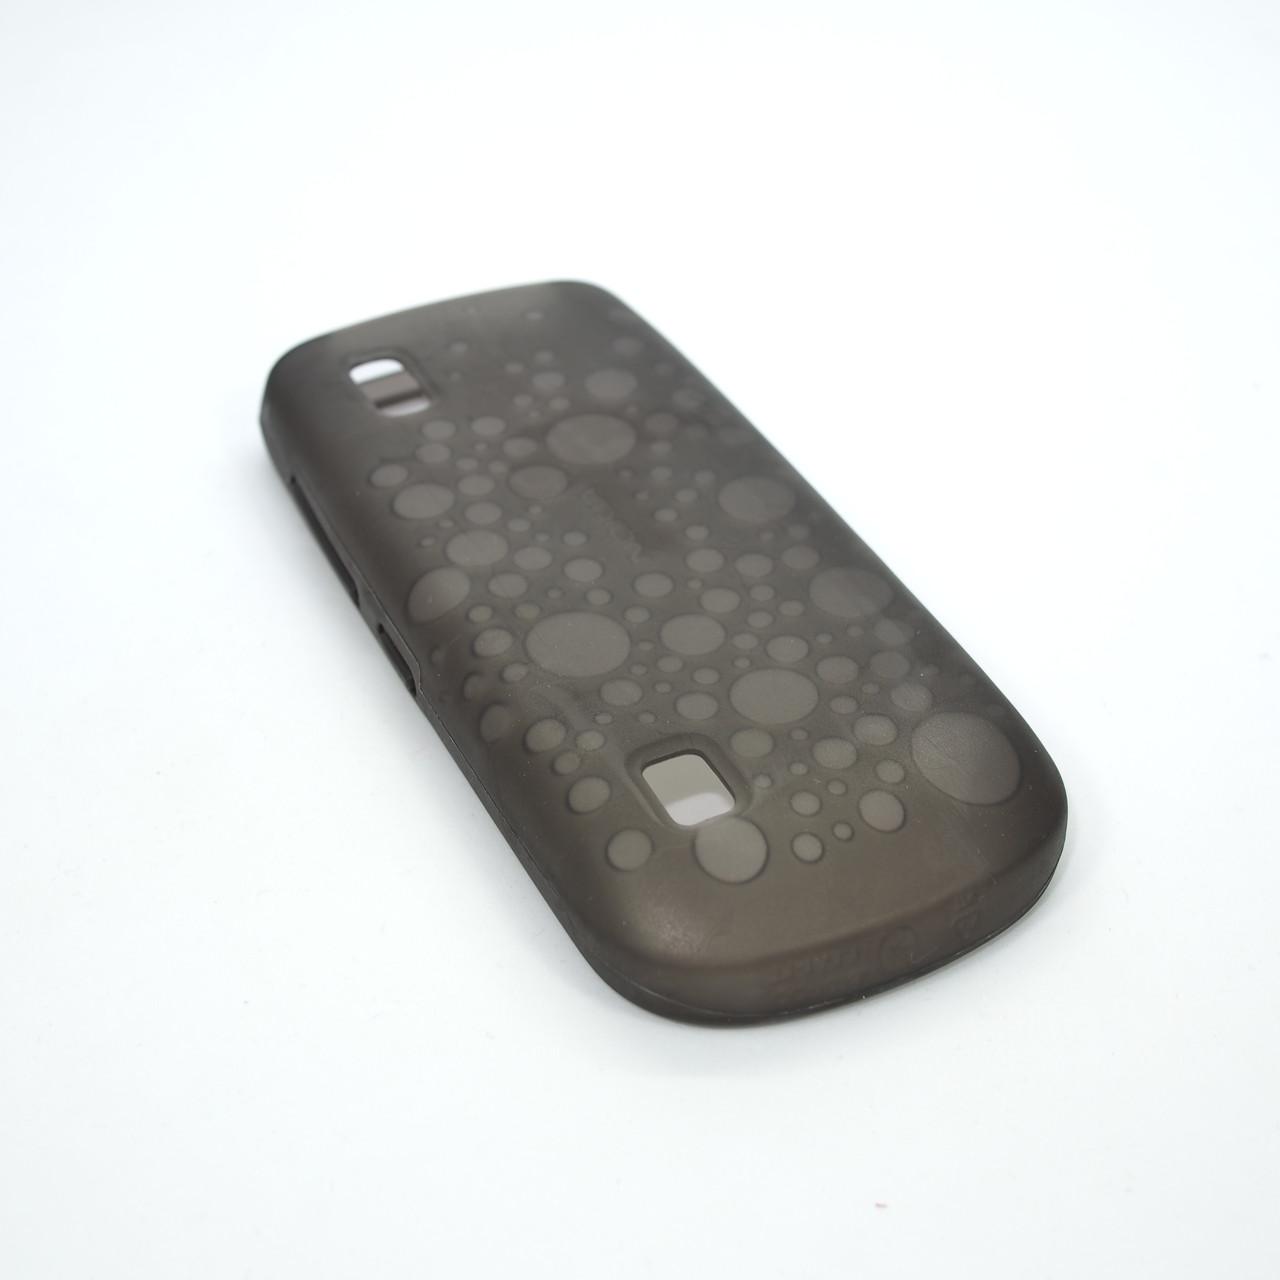 Чехол Nokia CC-1035 300 Silicone Cover black